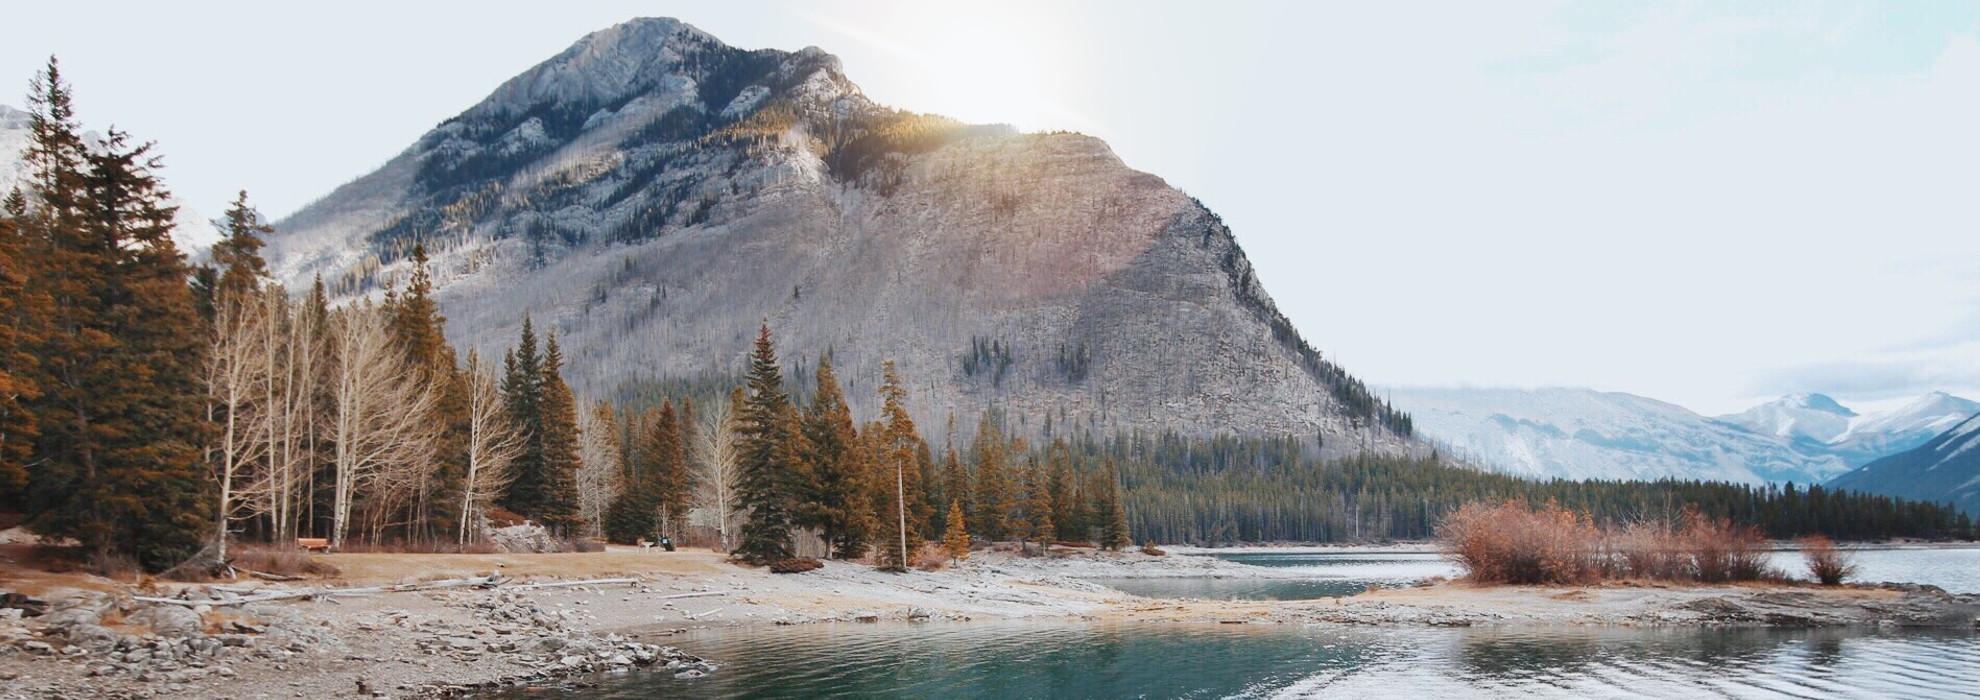 copper-river-bag-co-moutain-lake-43.jpg